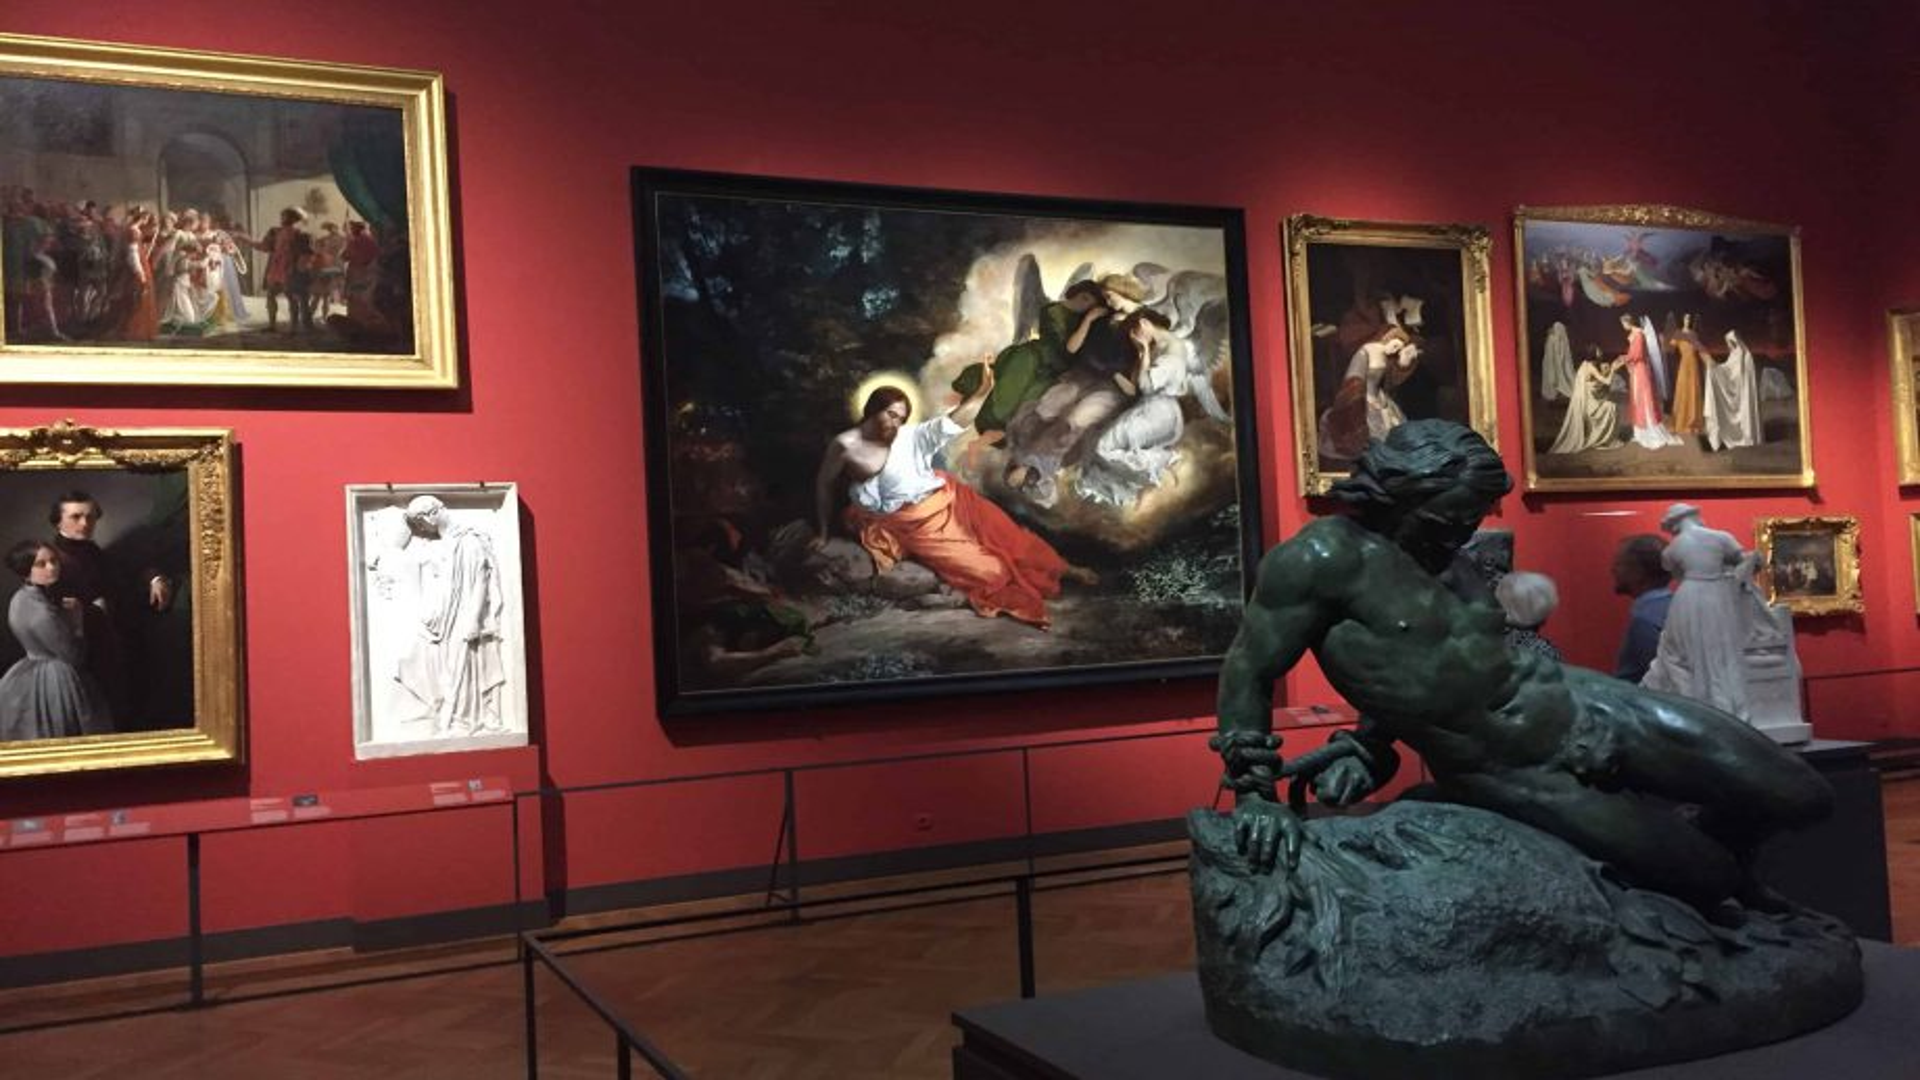 1815 – 1848: Paris amidst excitement and historicism